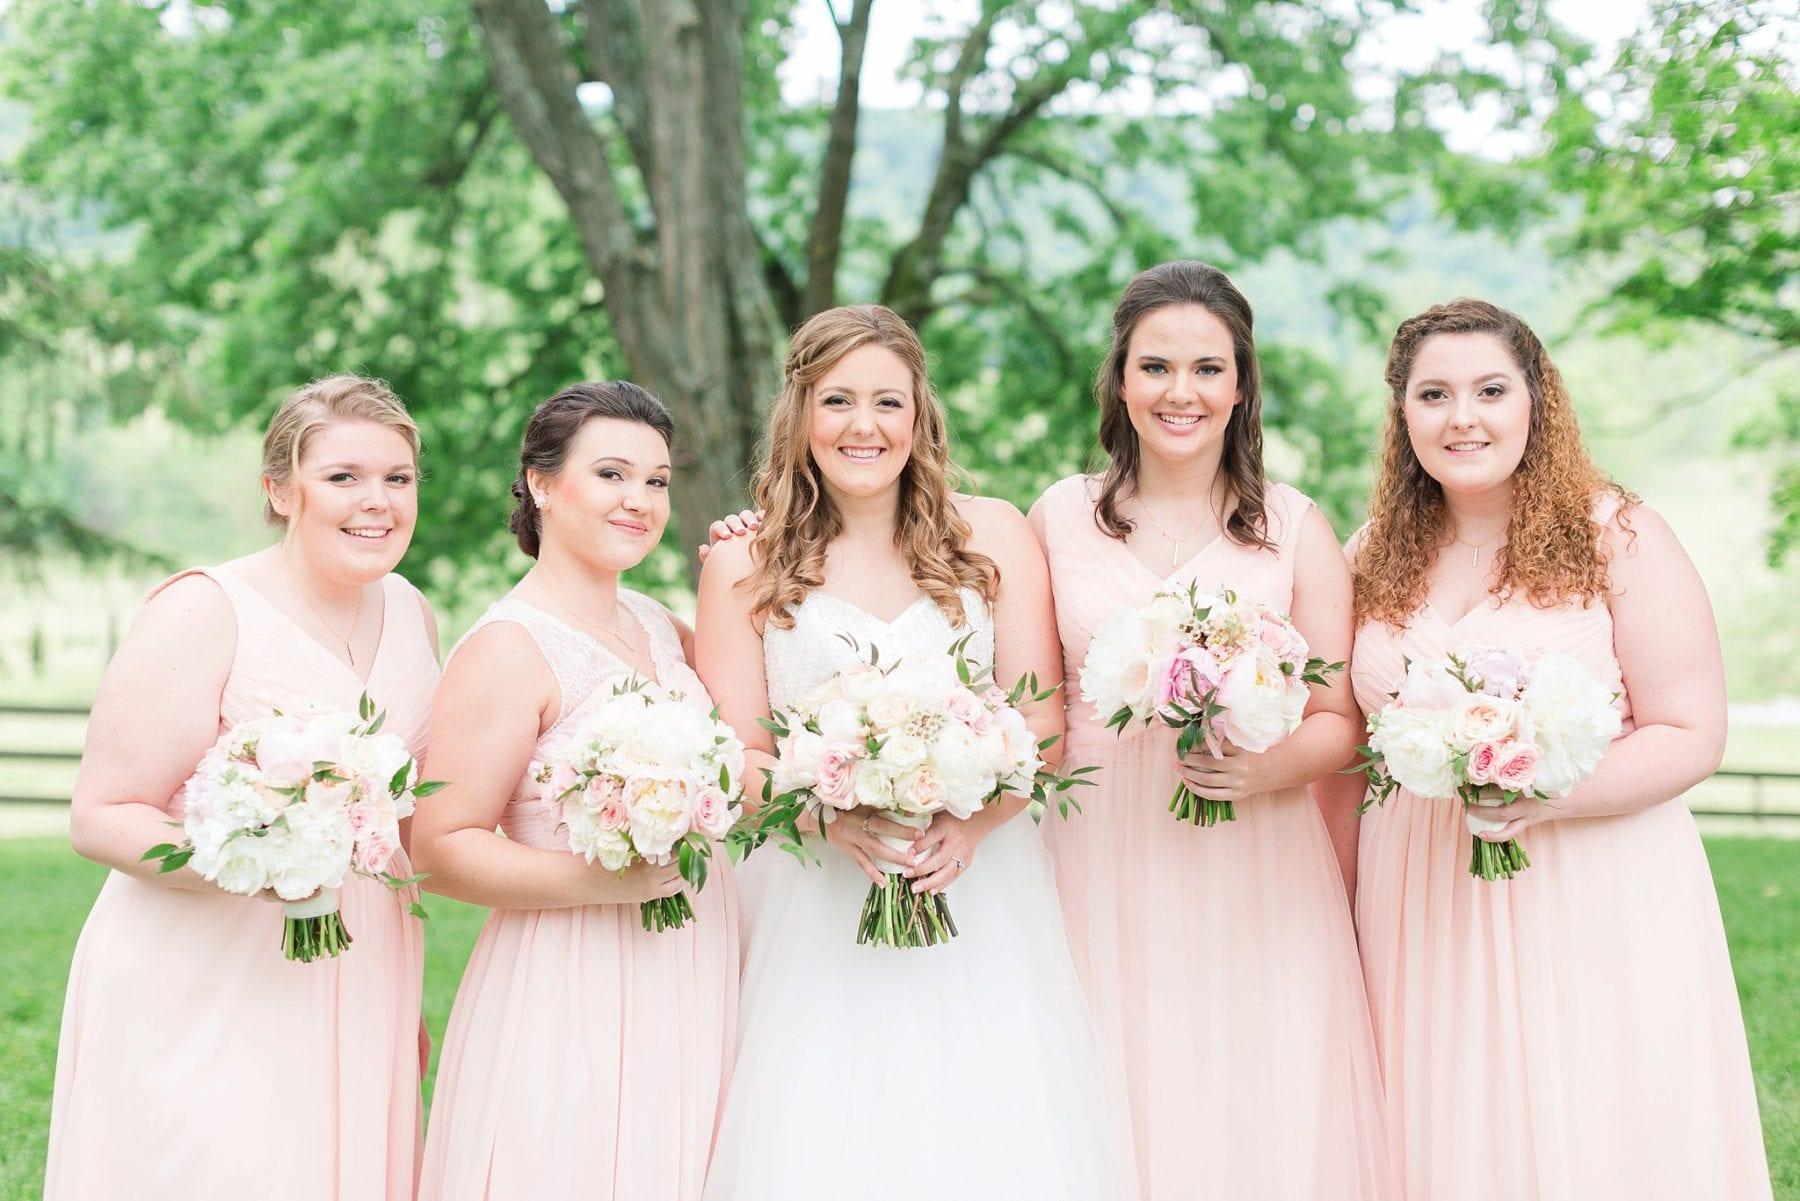 Justin & Megan Big Spring Farm Wedding Photos-159.jpg